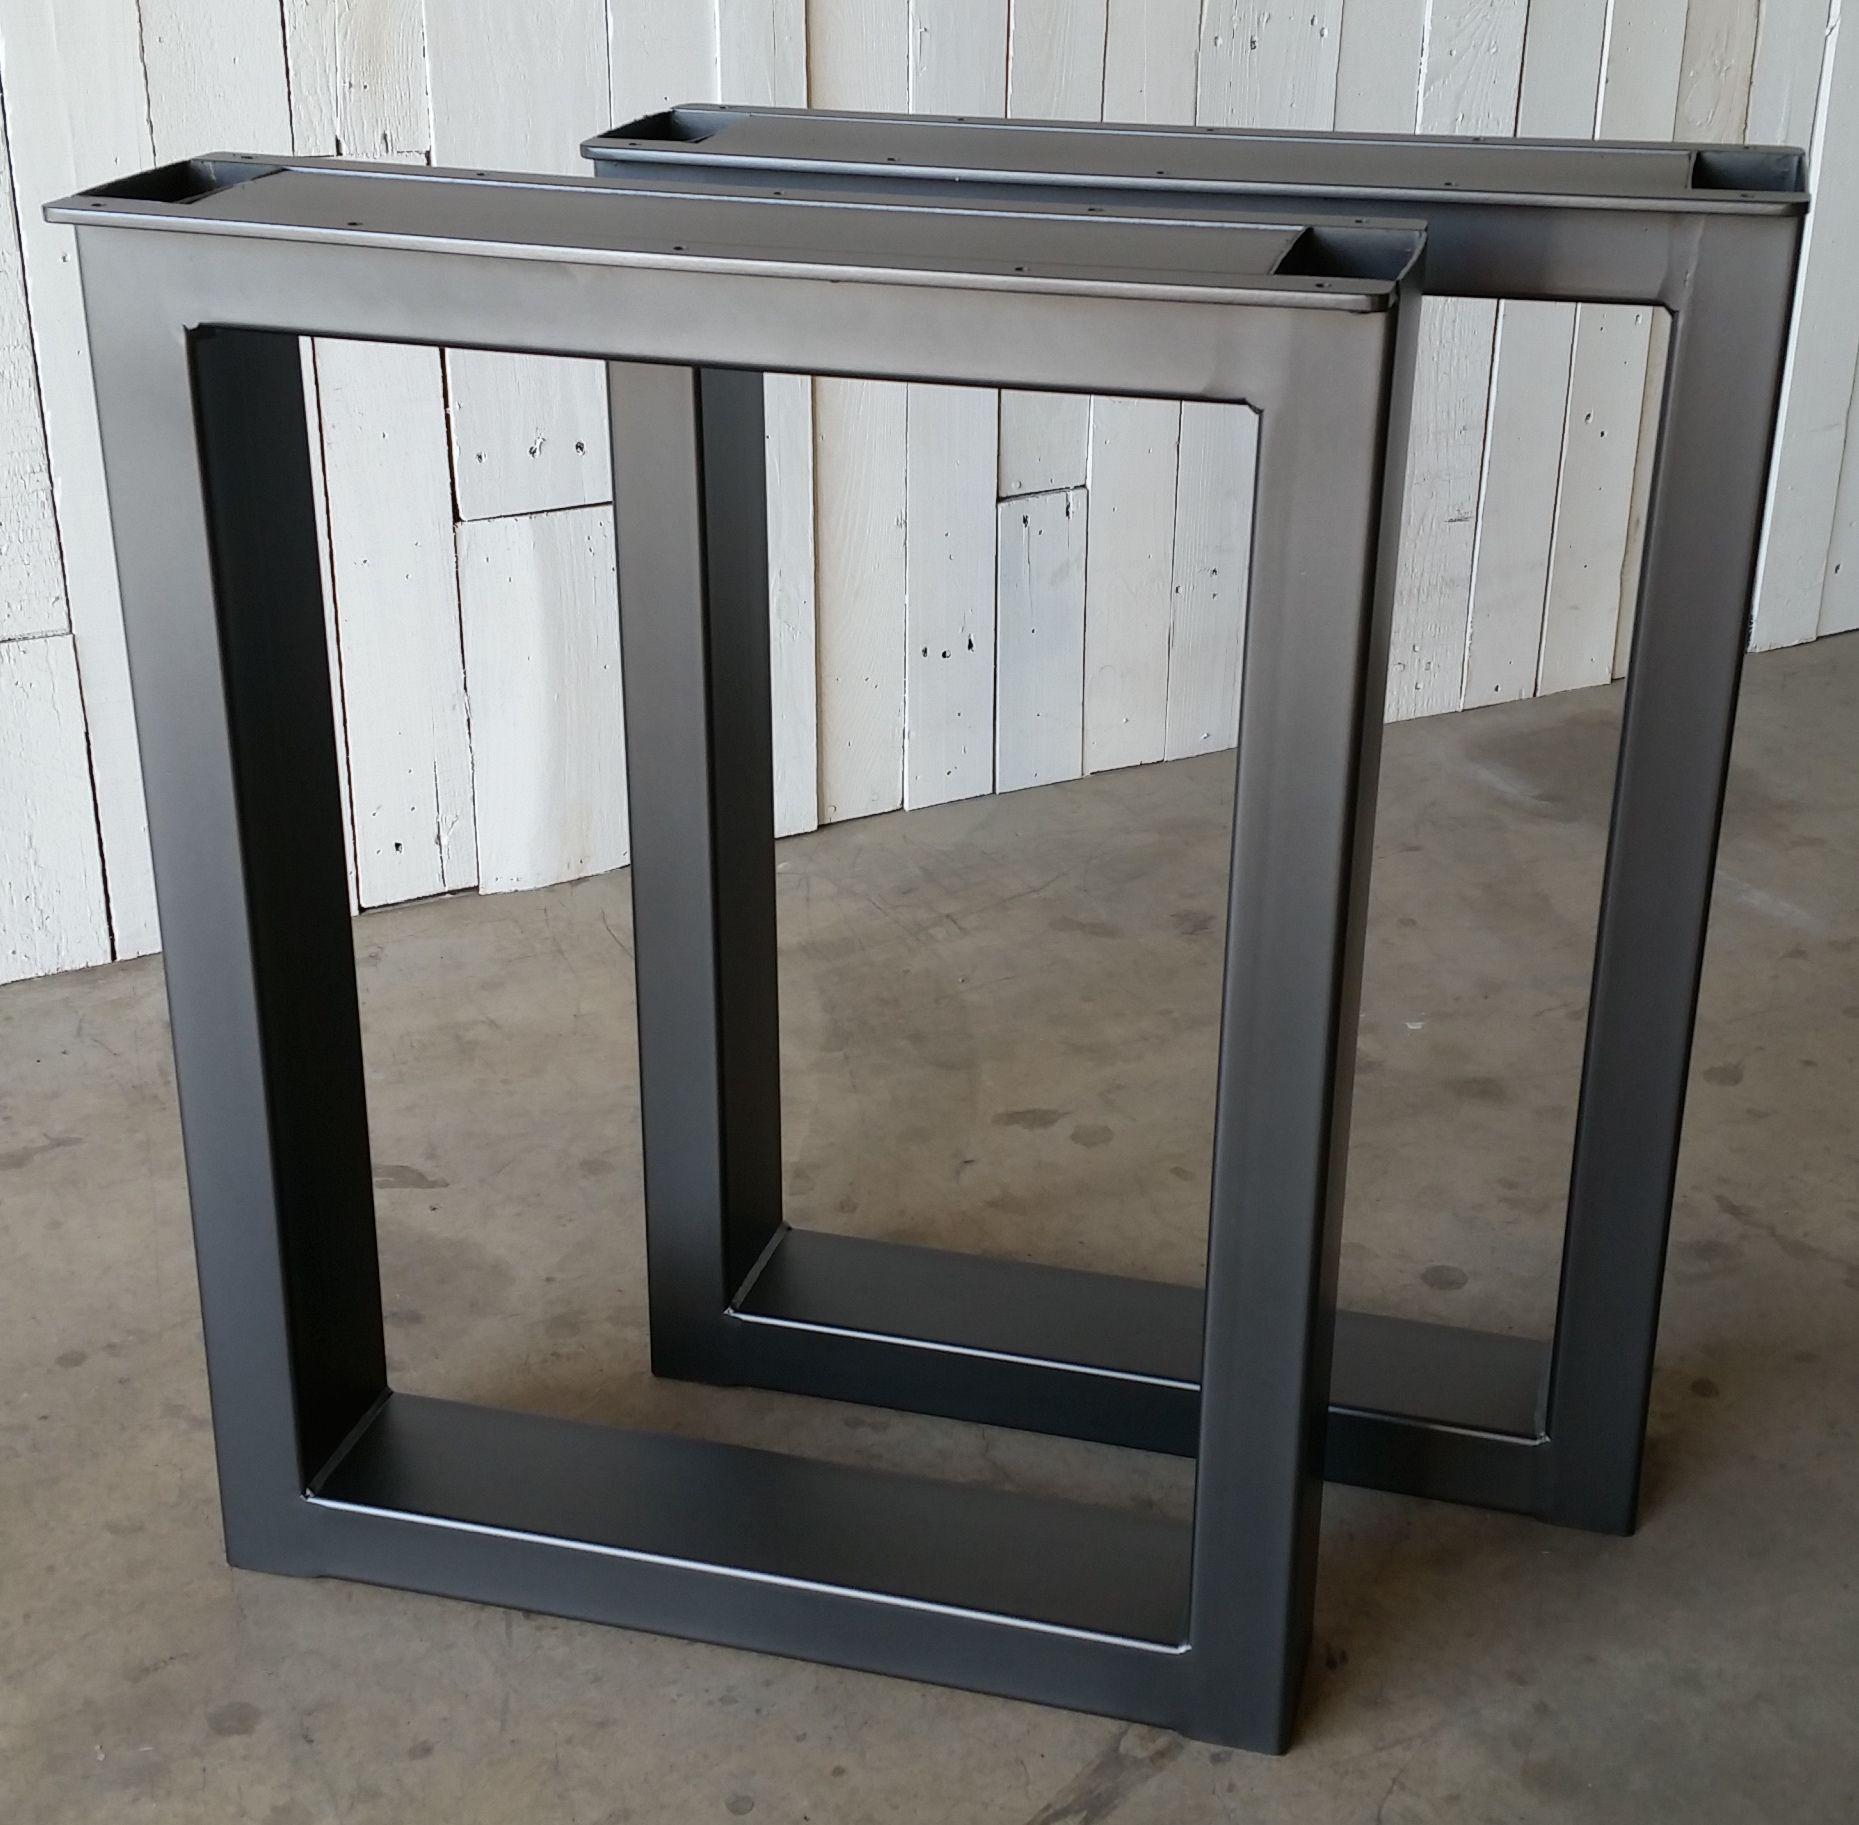 Modern Metal Furniture Legs Chairs Seating